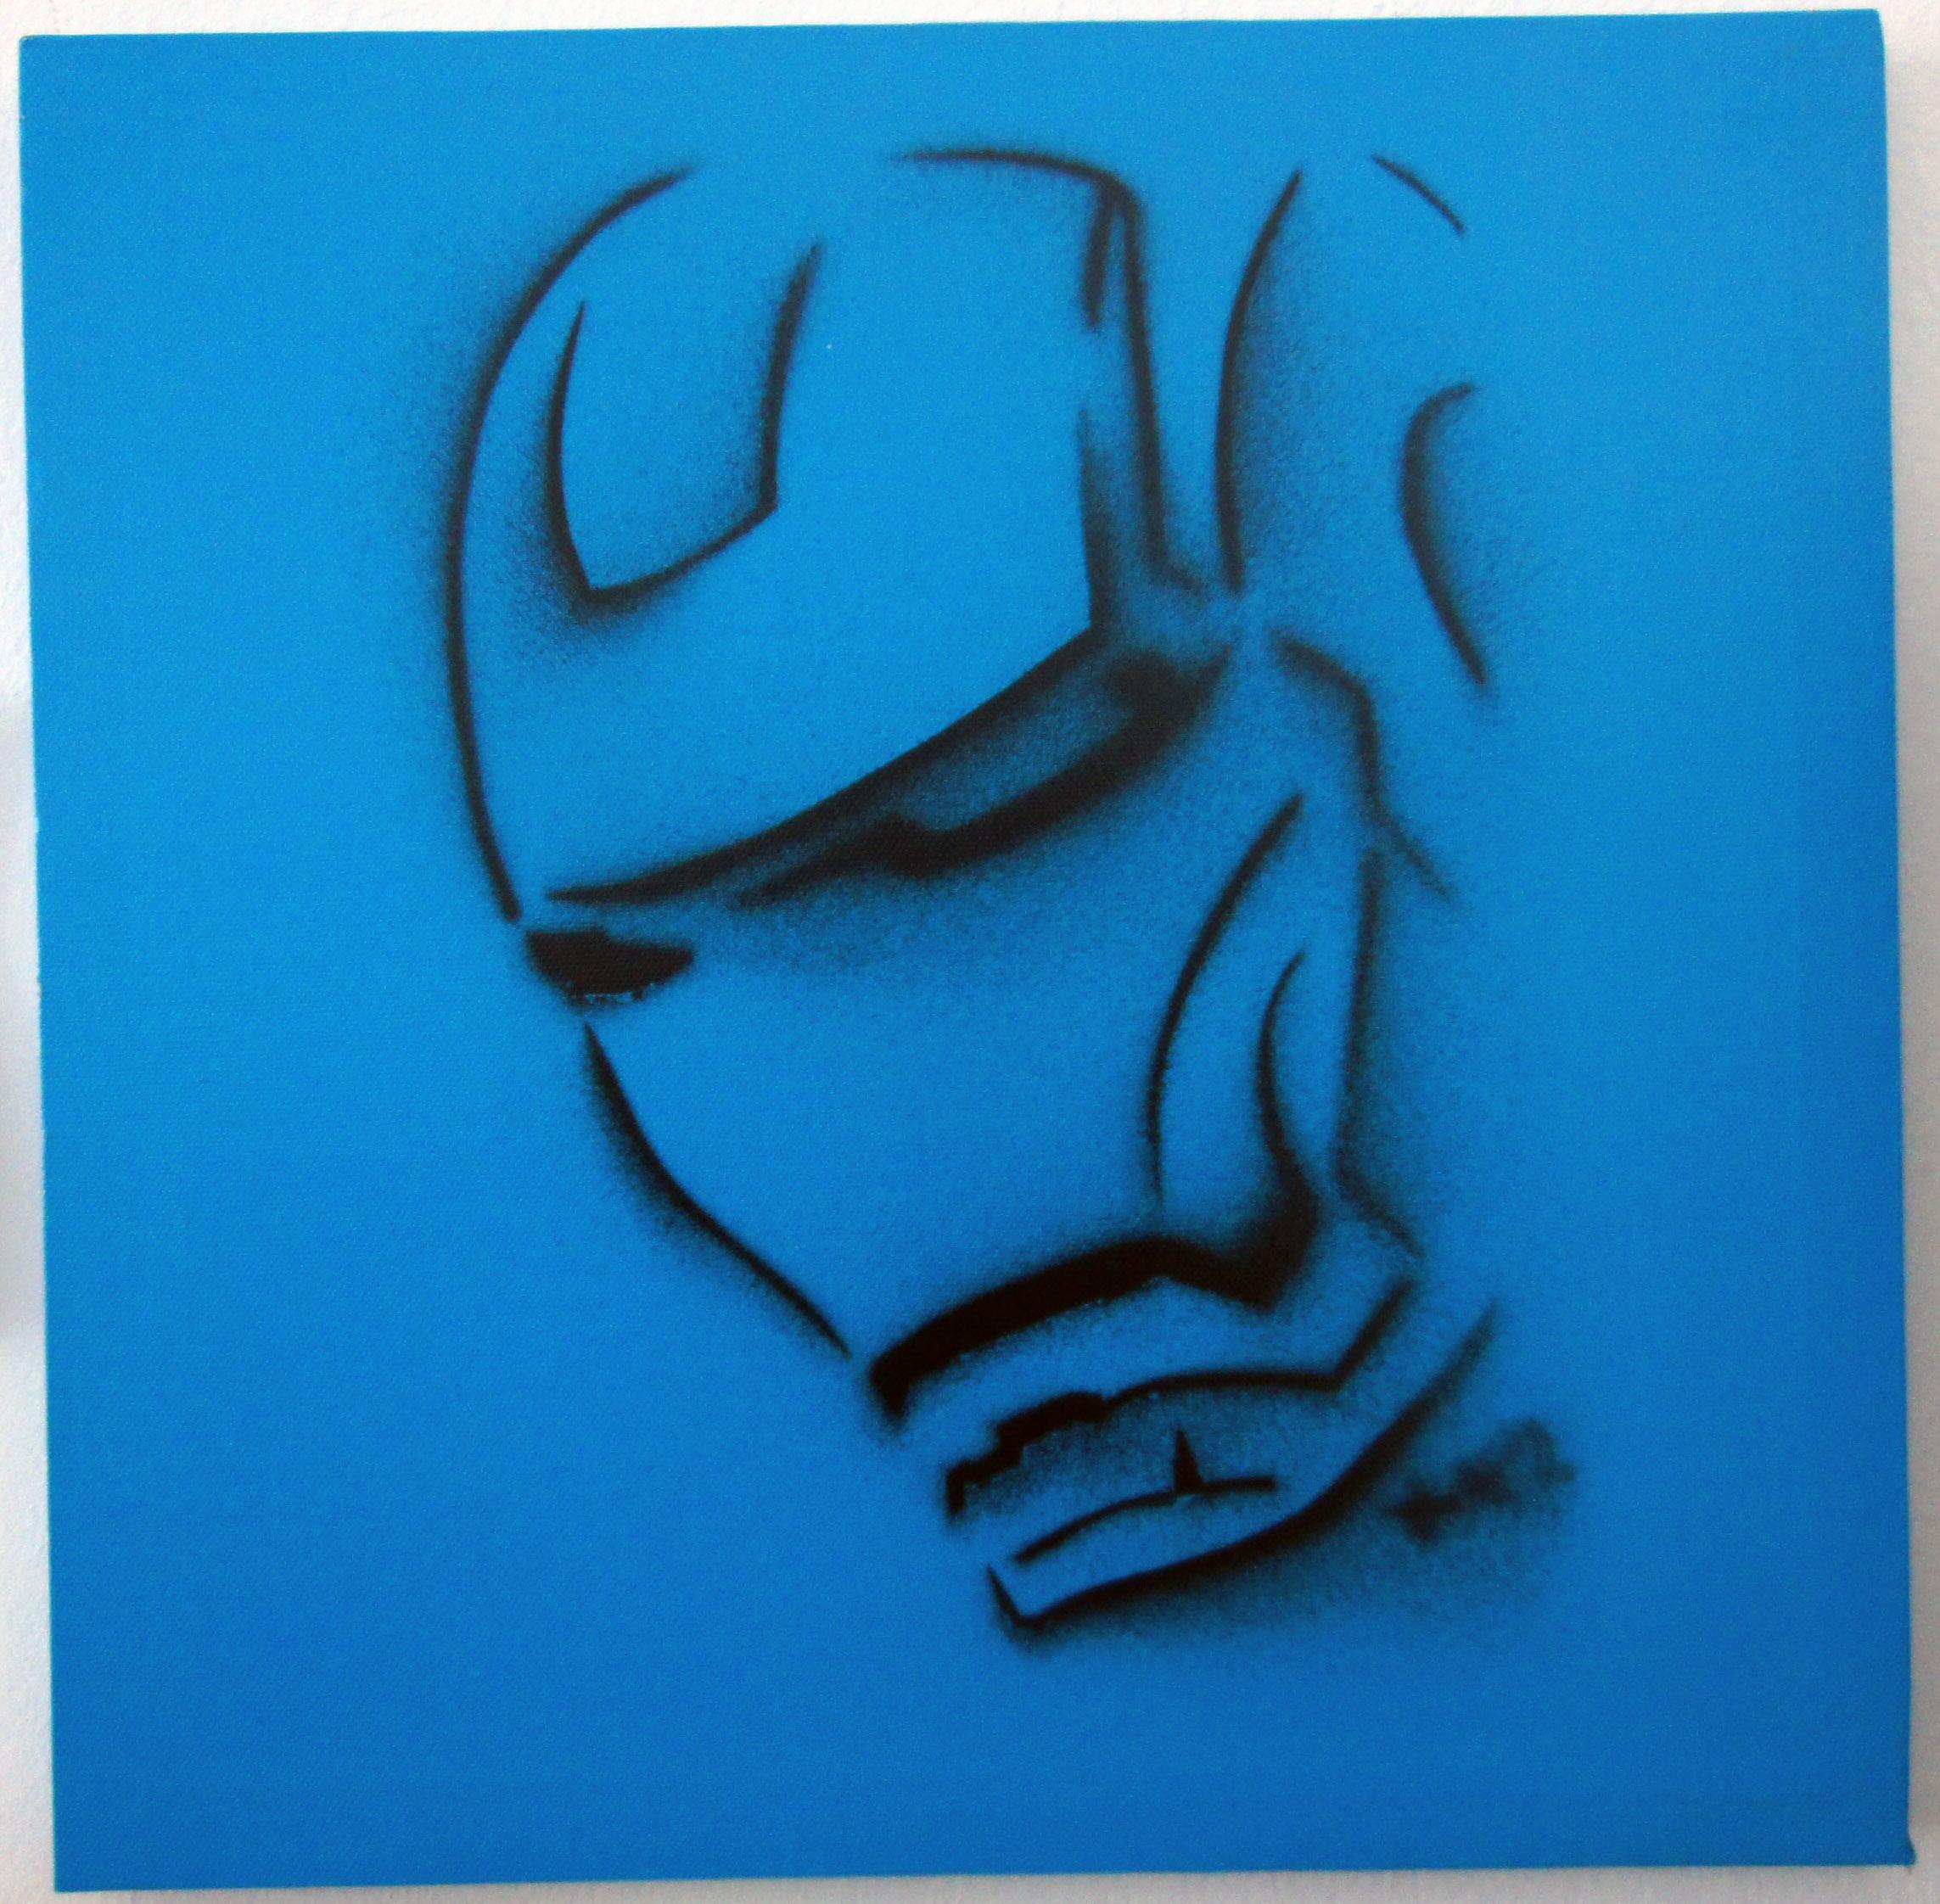 Croissant Iron man Pochoir (Stencil) by URBN 1311 | Trampt Library ZY-54